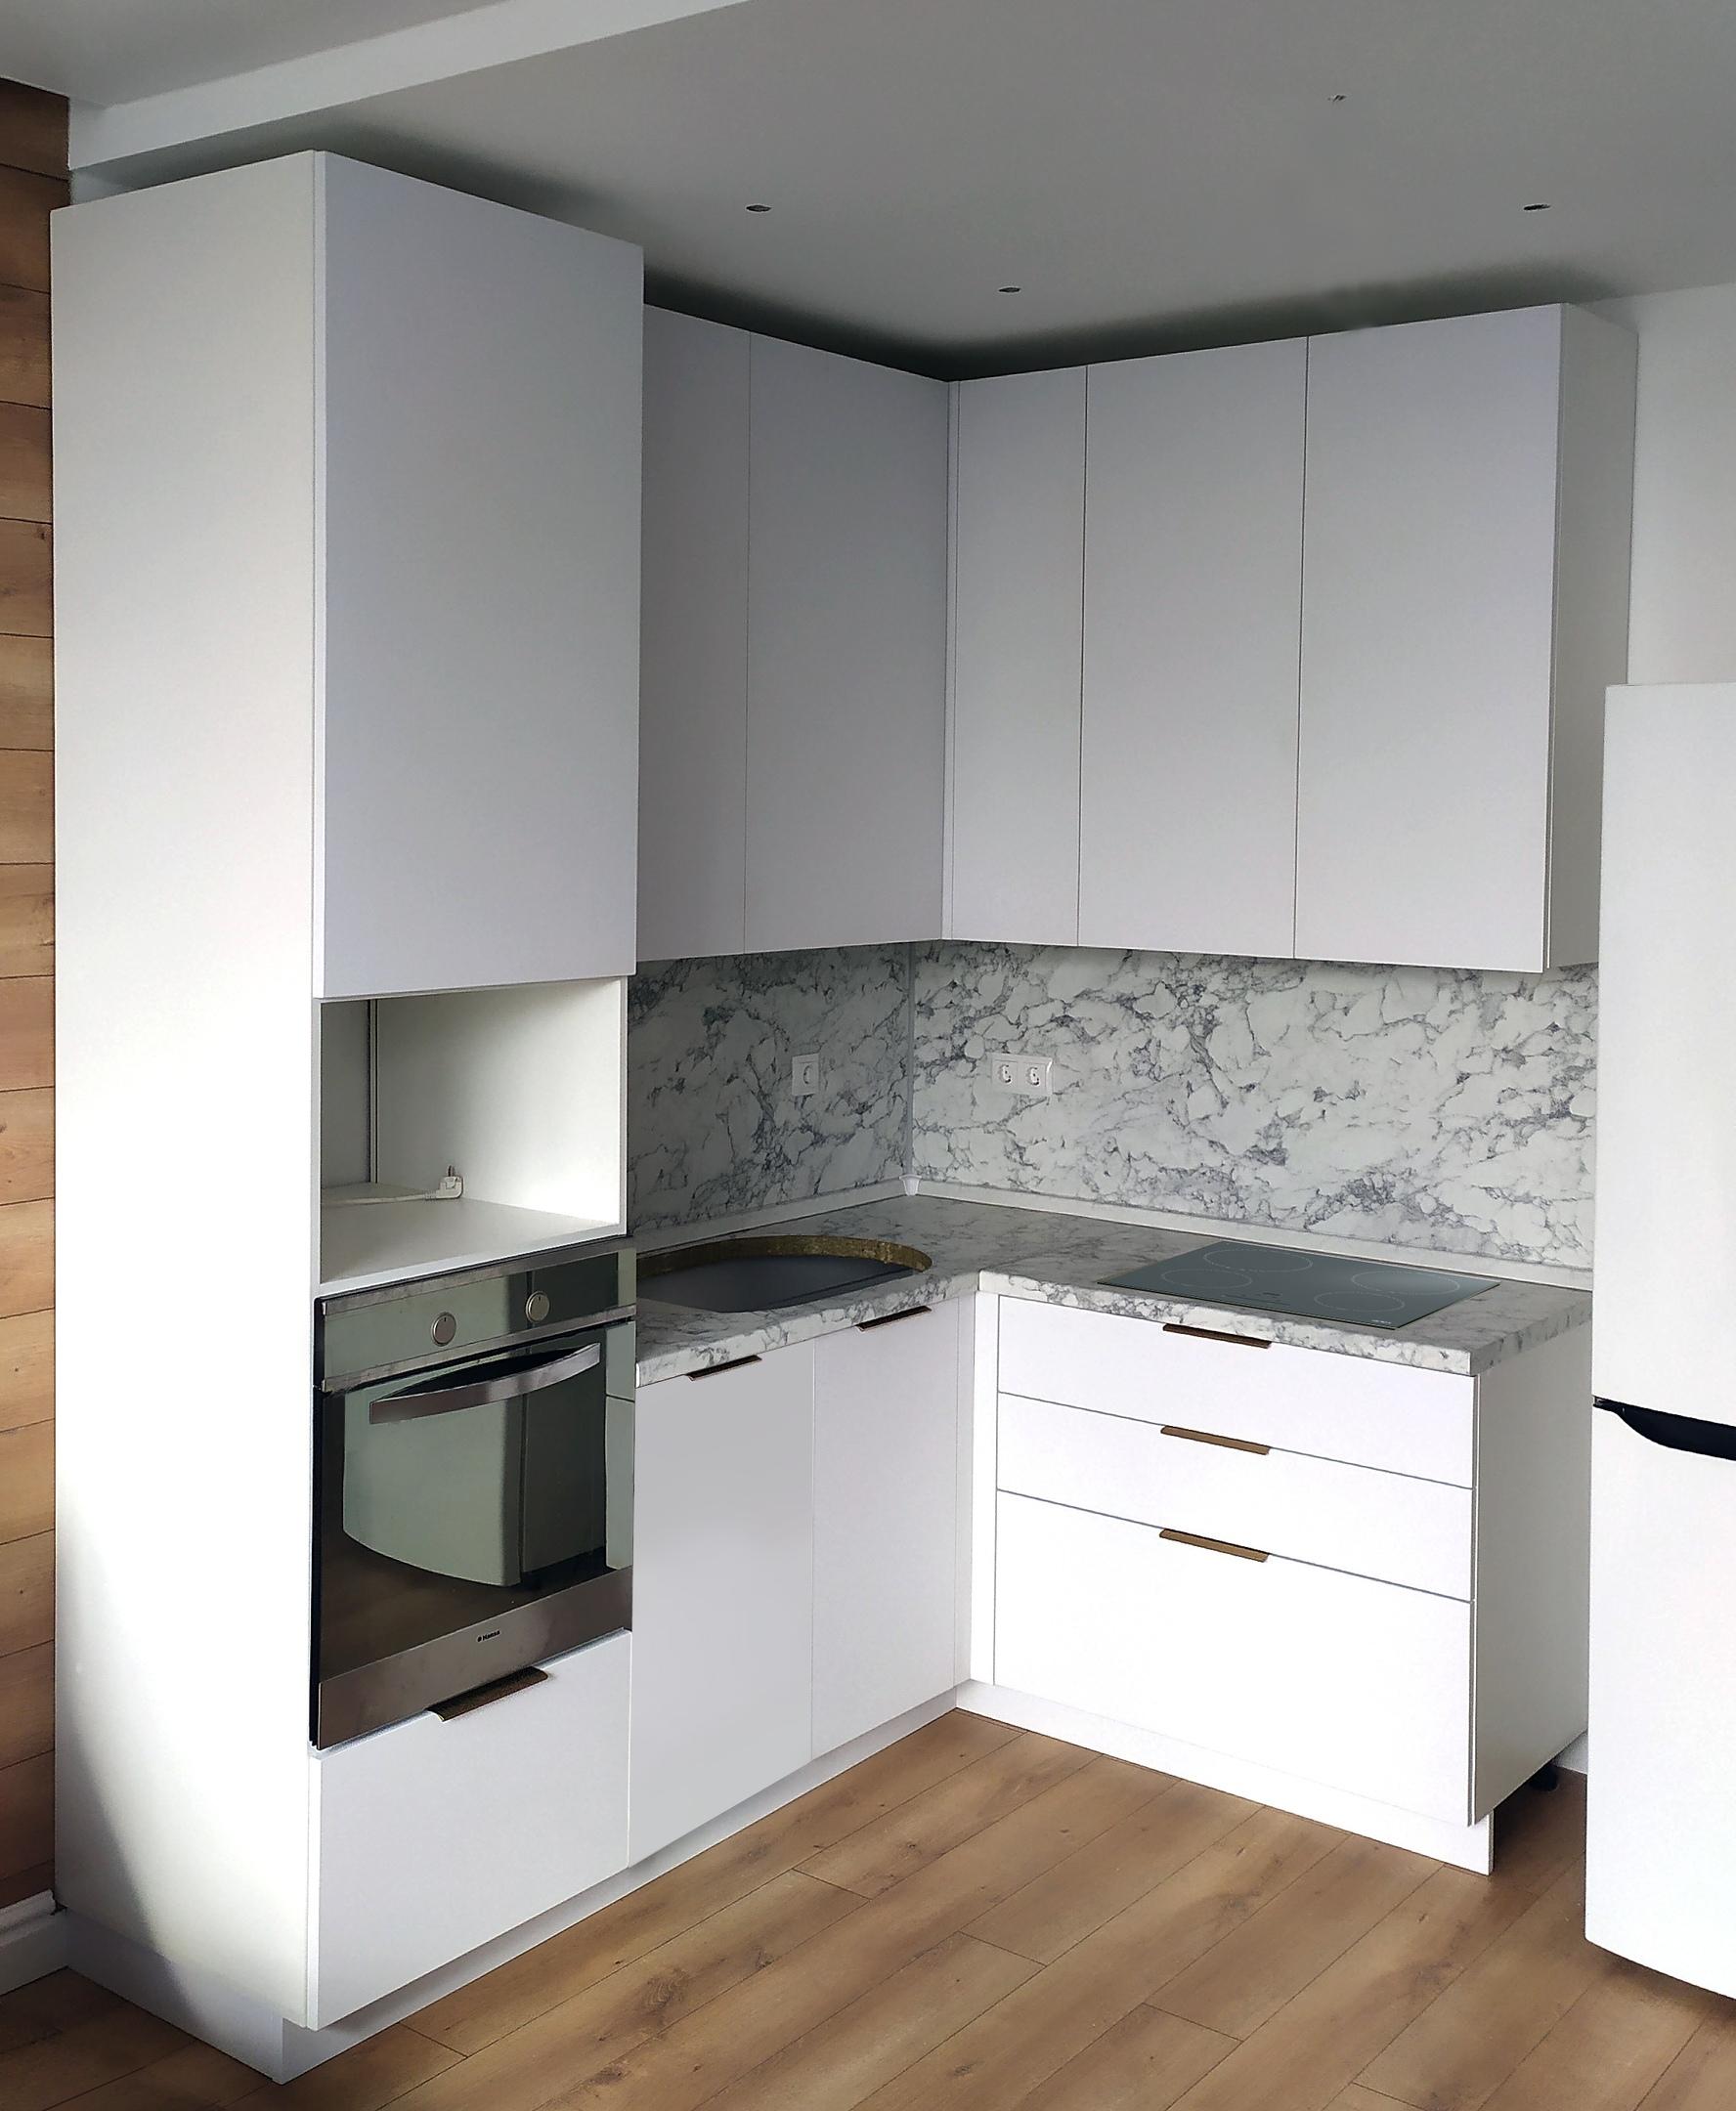 маленький угловой кухонный гарнитур